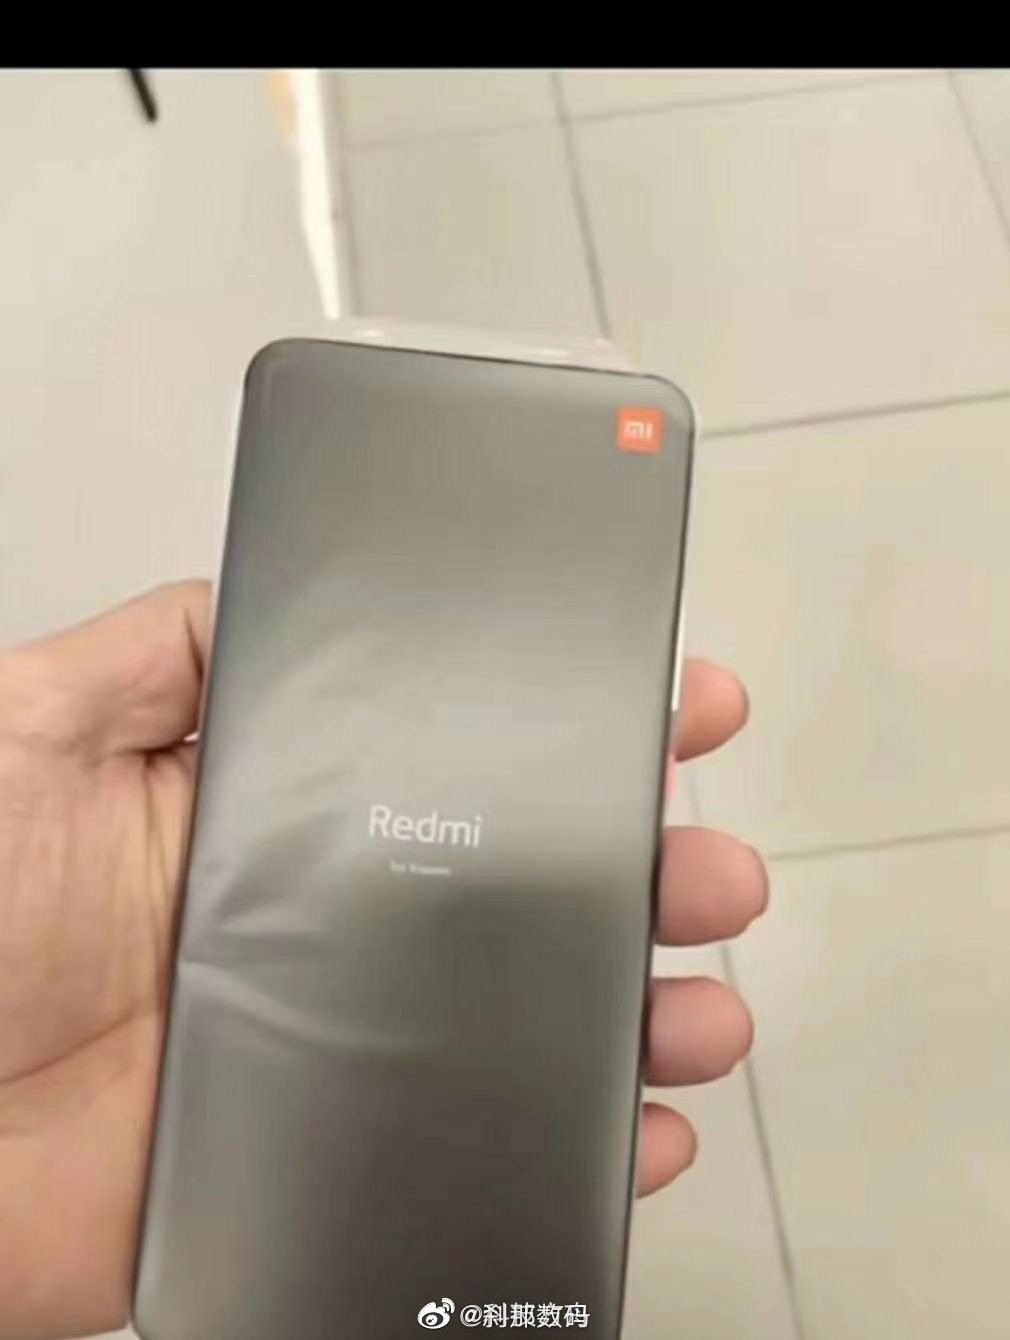 Redmi K30 Pro 5G live images look astonish 1